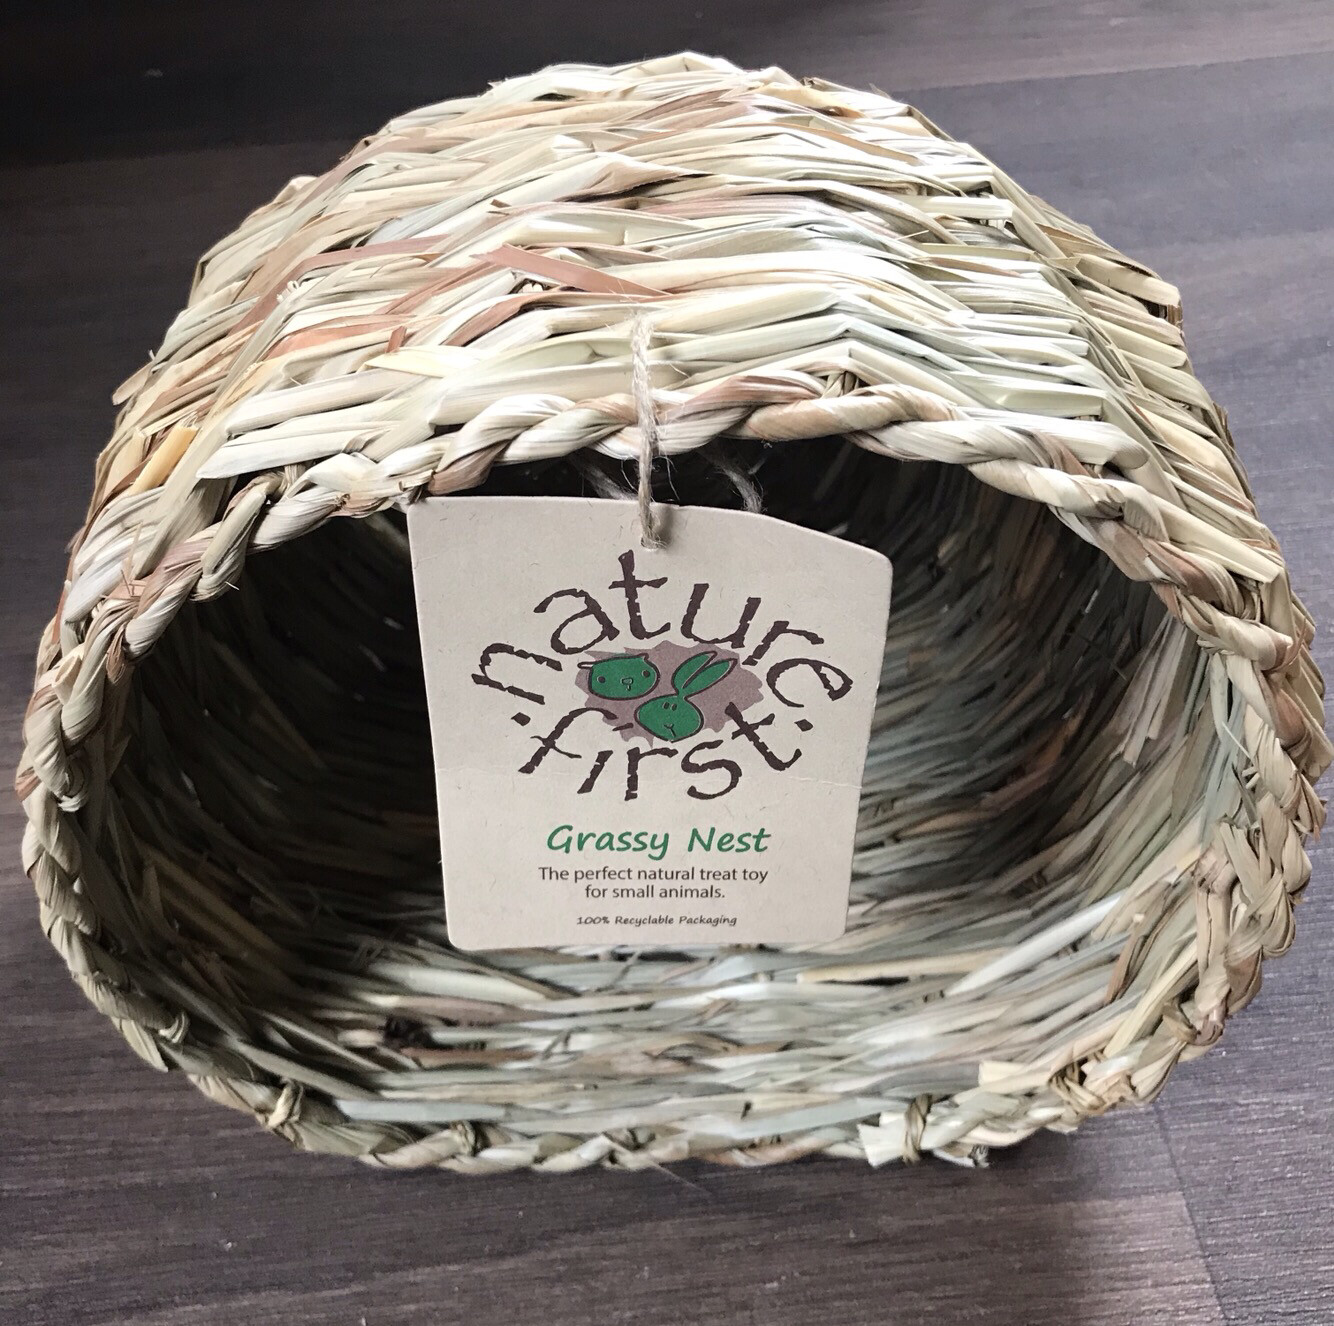 SA Nature First Grassy Nest 23cm